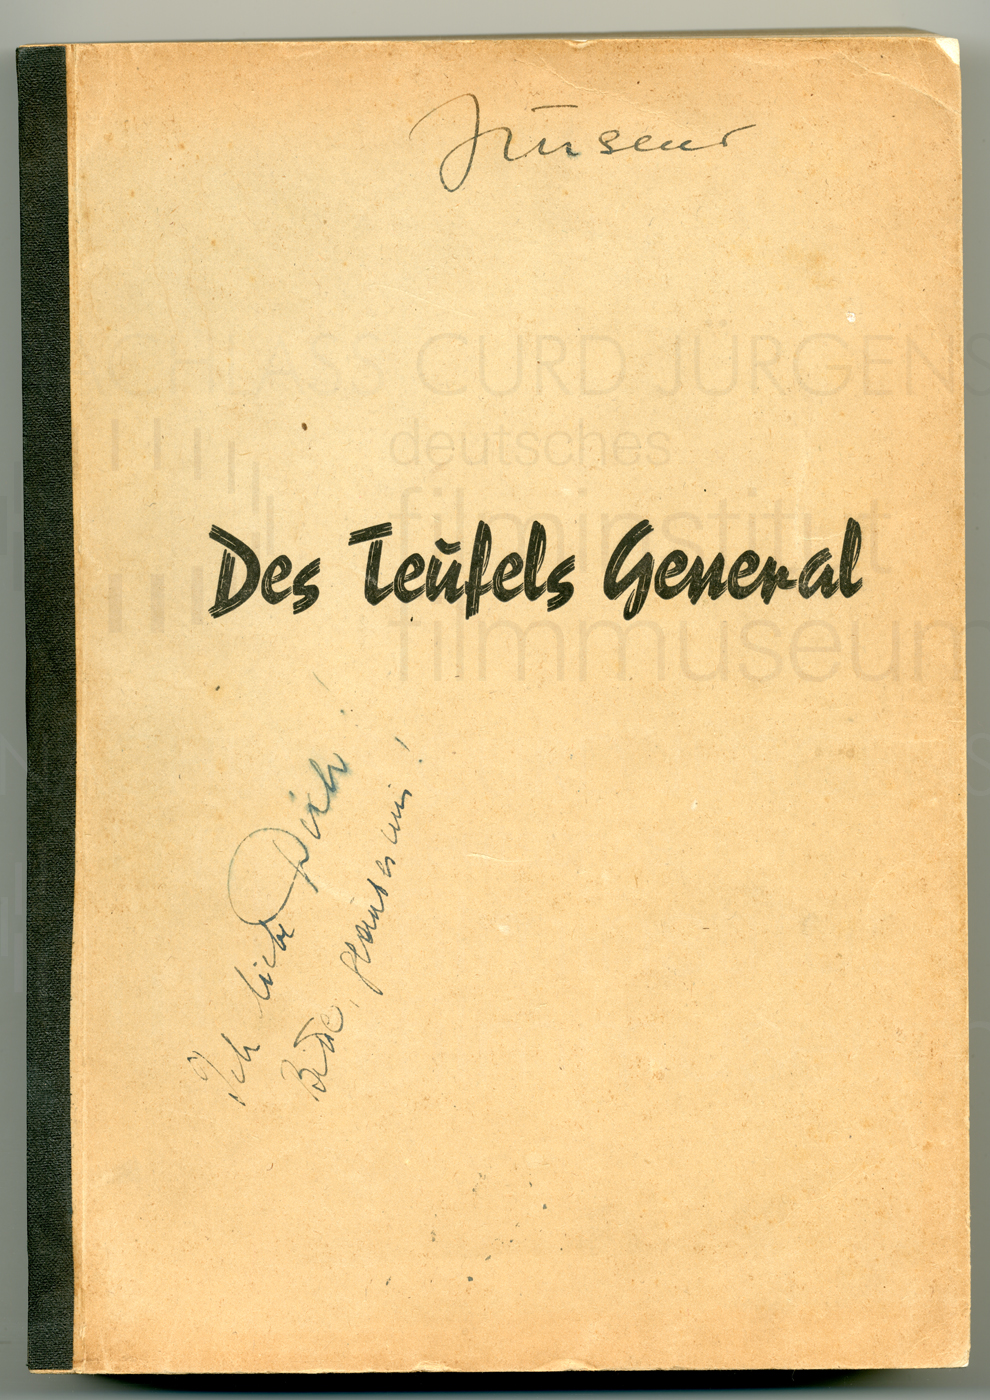 DES TEUFELS GENERAL (1955) Drehbuch (Auszug)